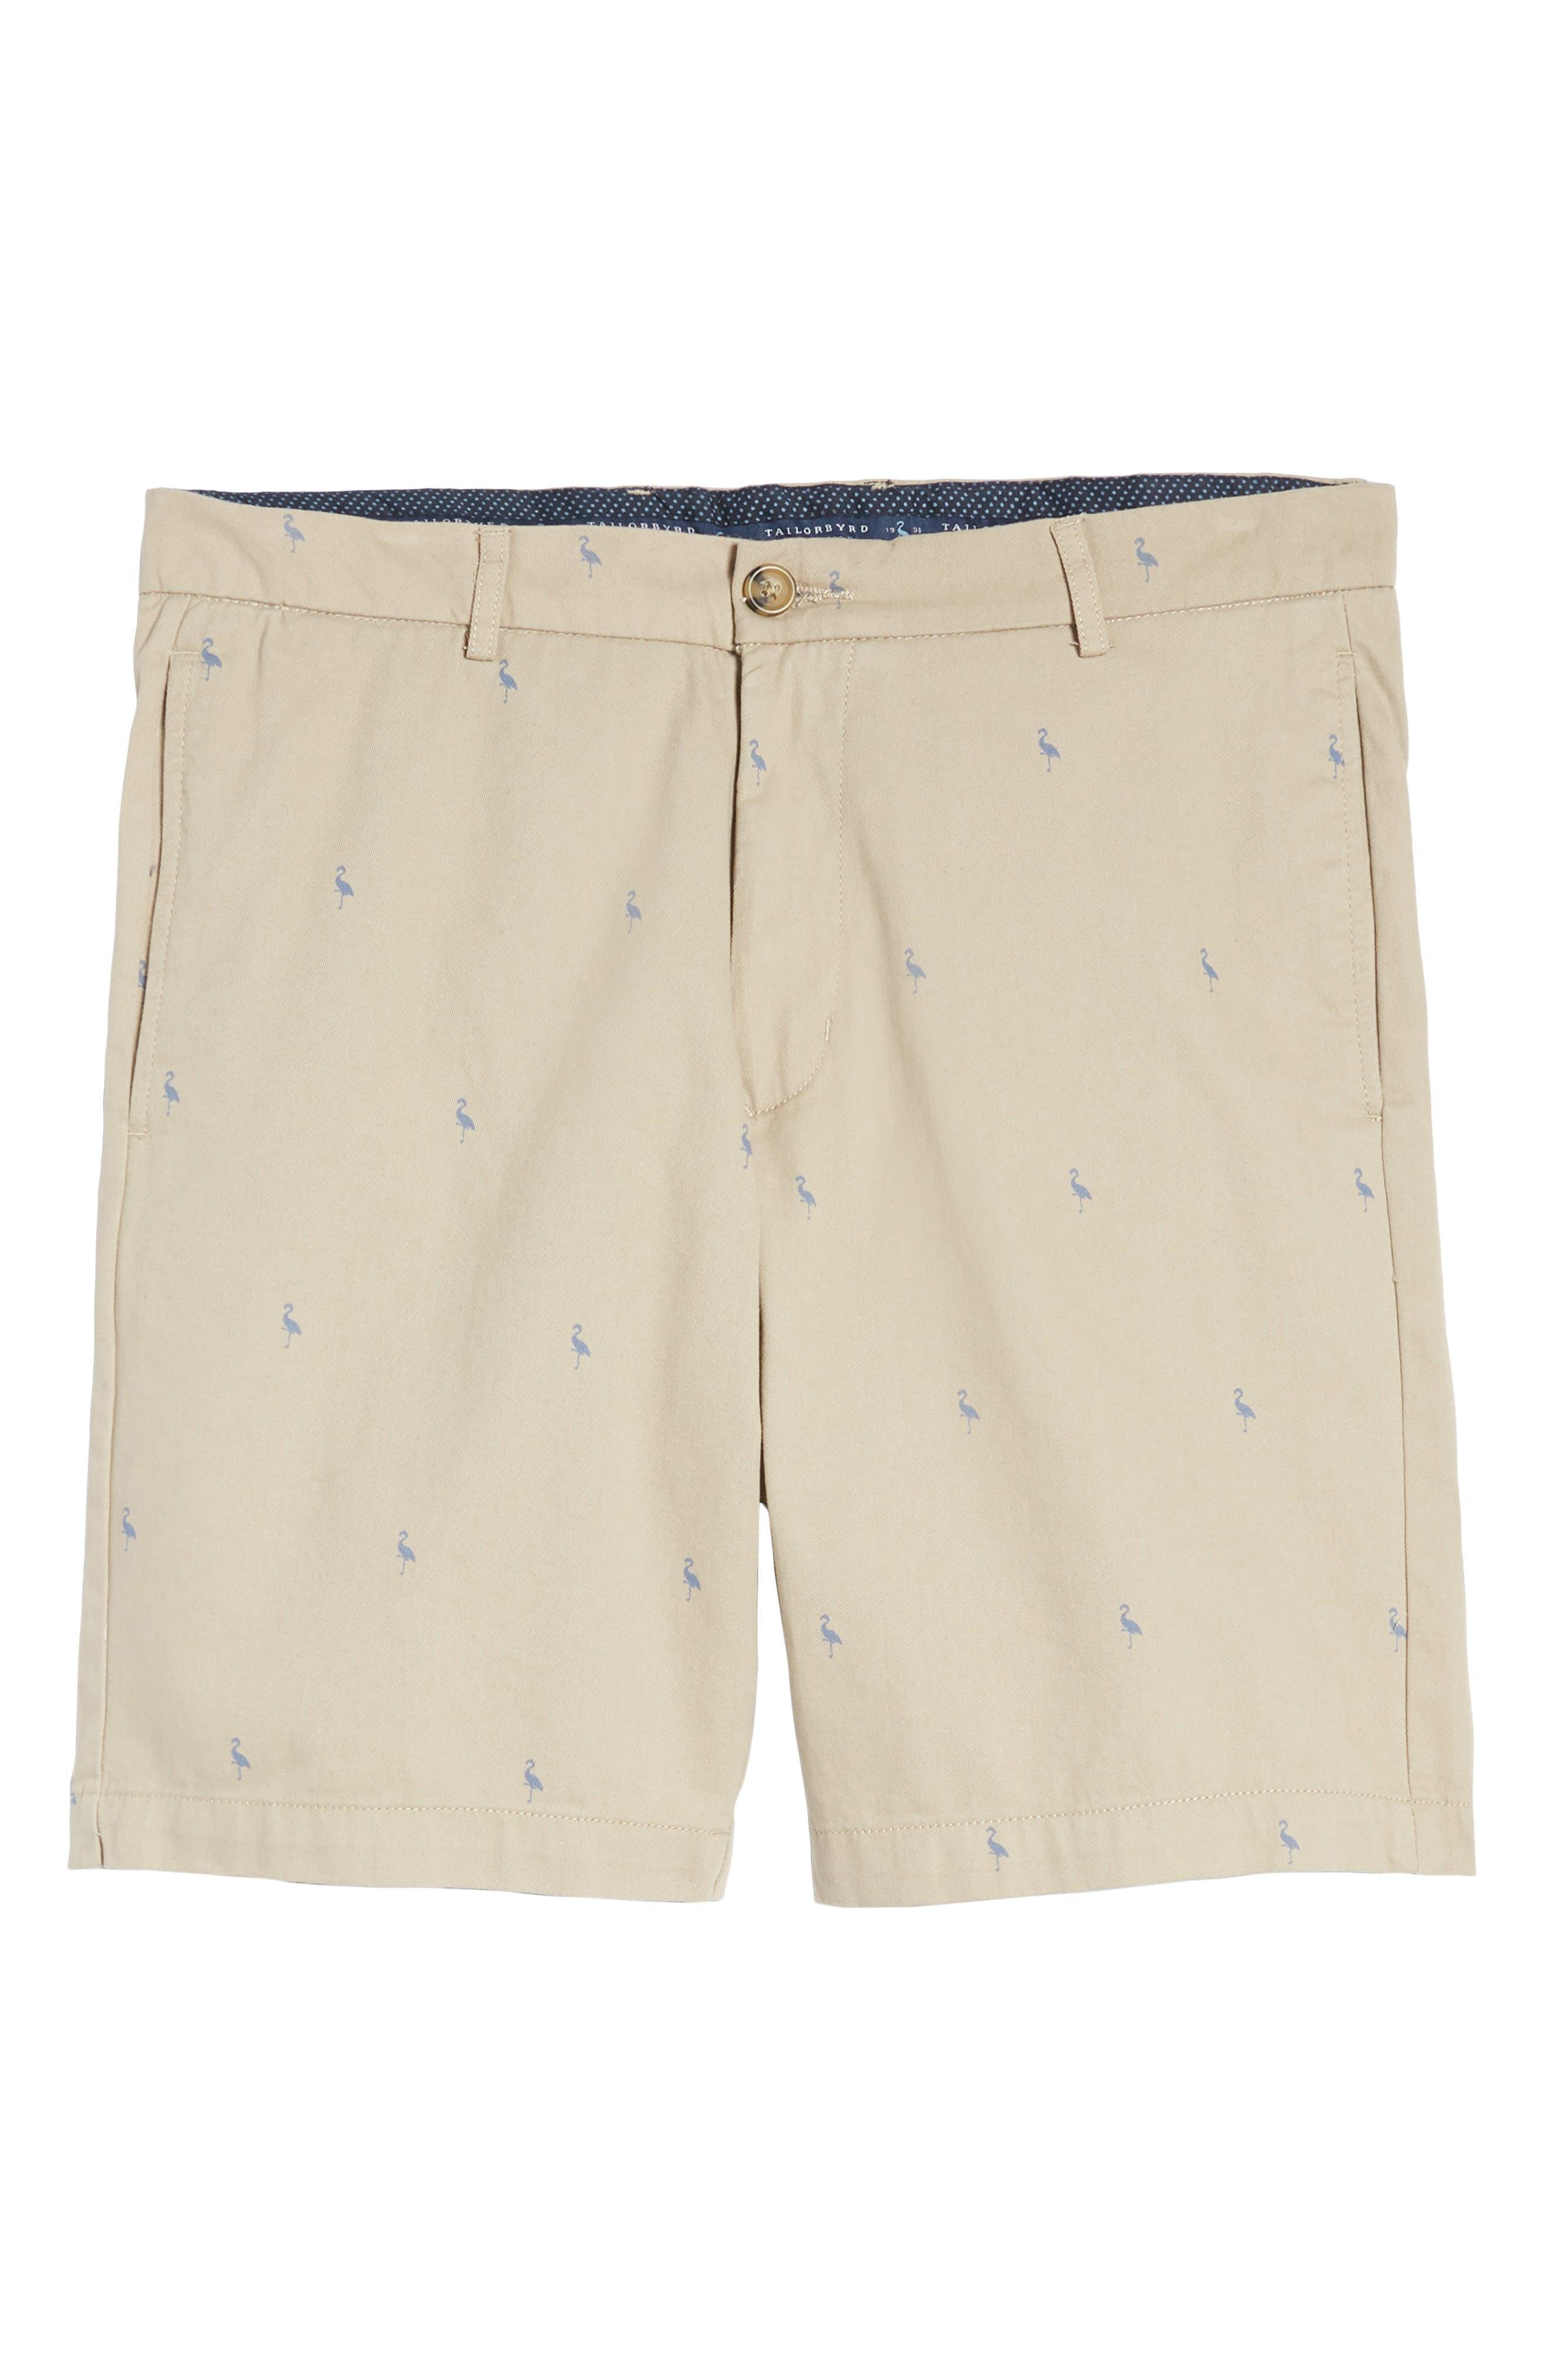 Baden Bird Regular Fit Chino Shorts,                             Alternate thumbnail 6, color,                             Dark Khaki